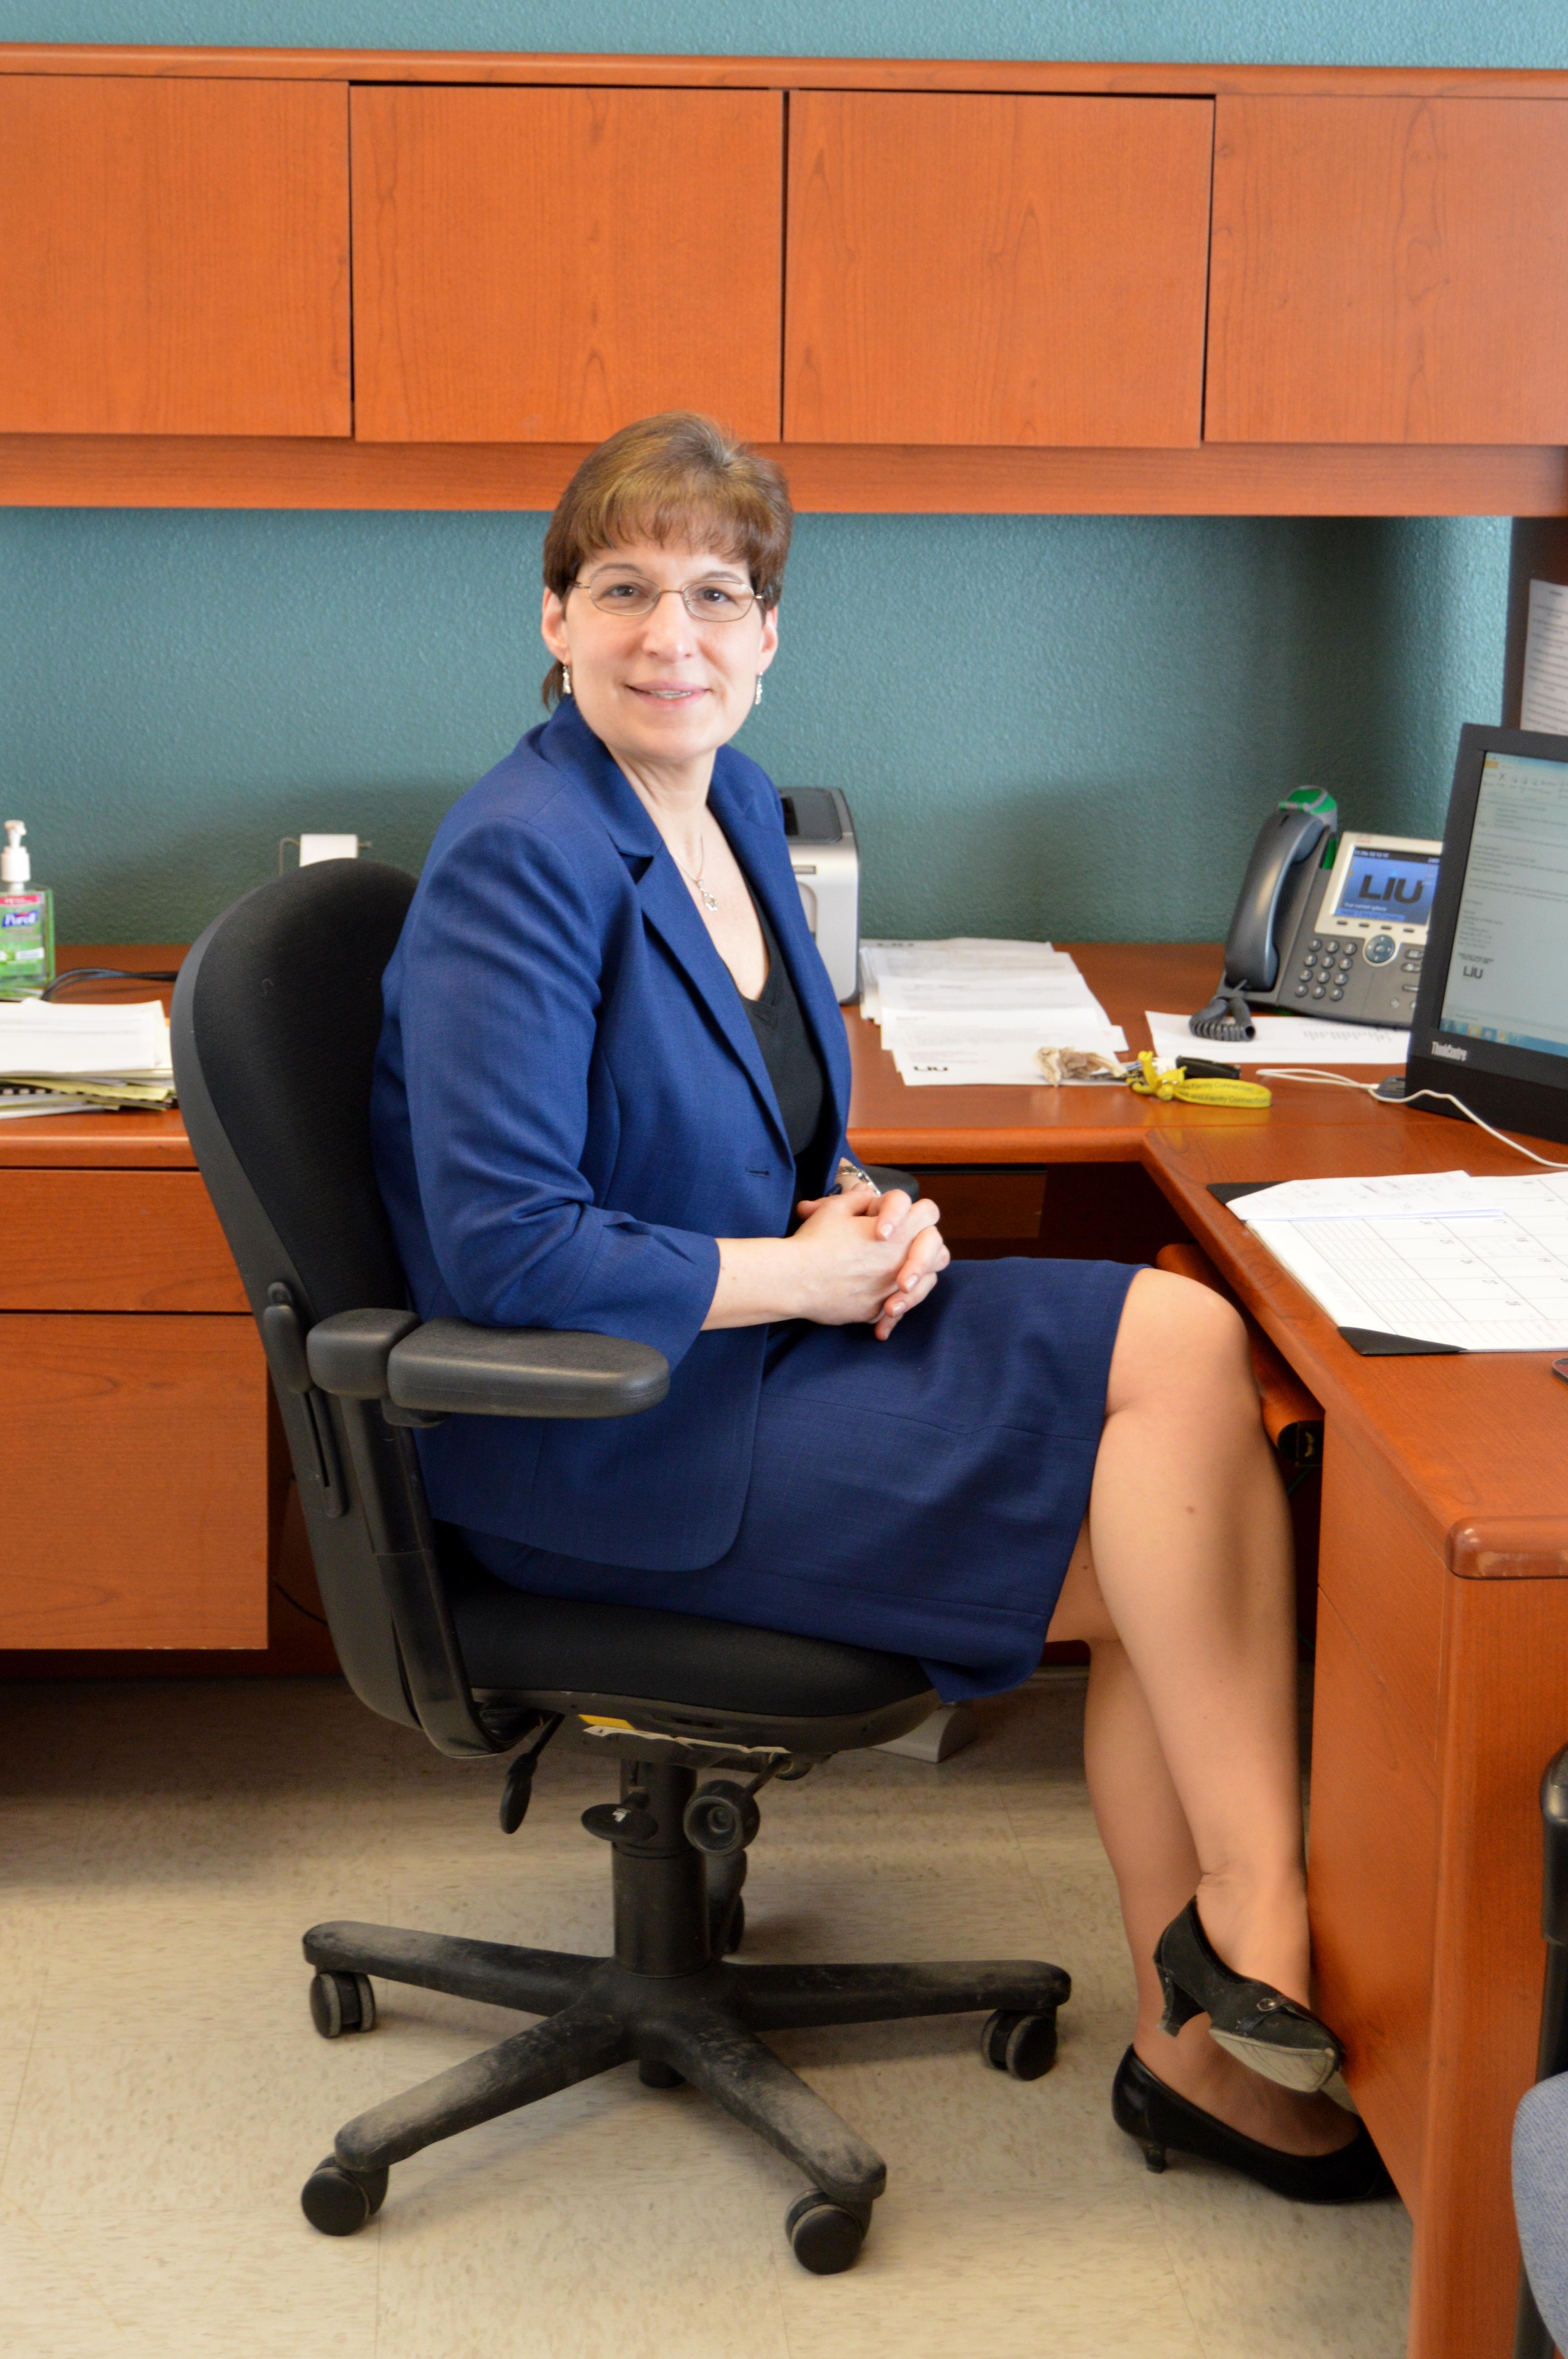 Associate Dean of Students, Jean Smith. Photo: Janisha Sanford